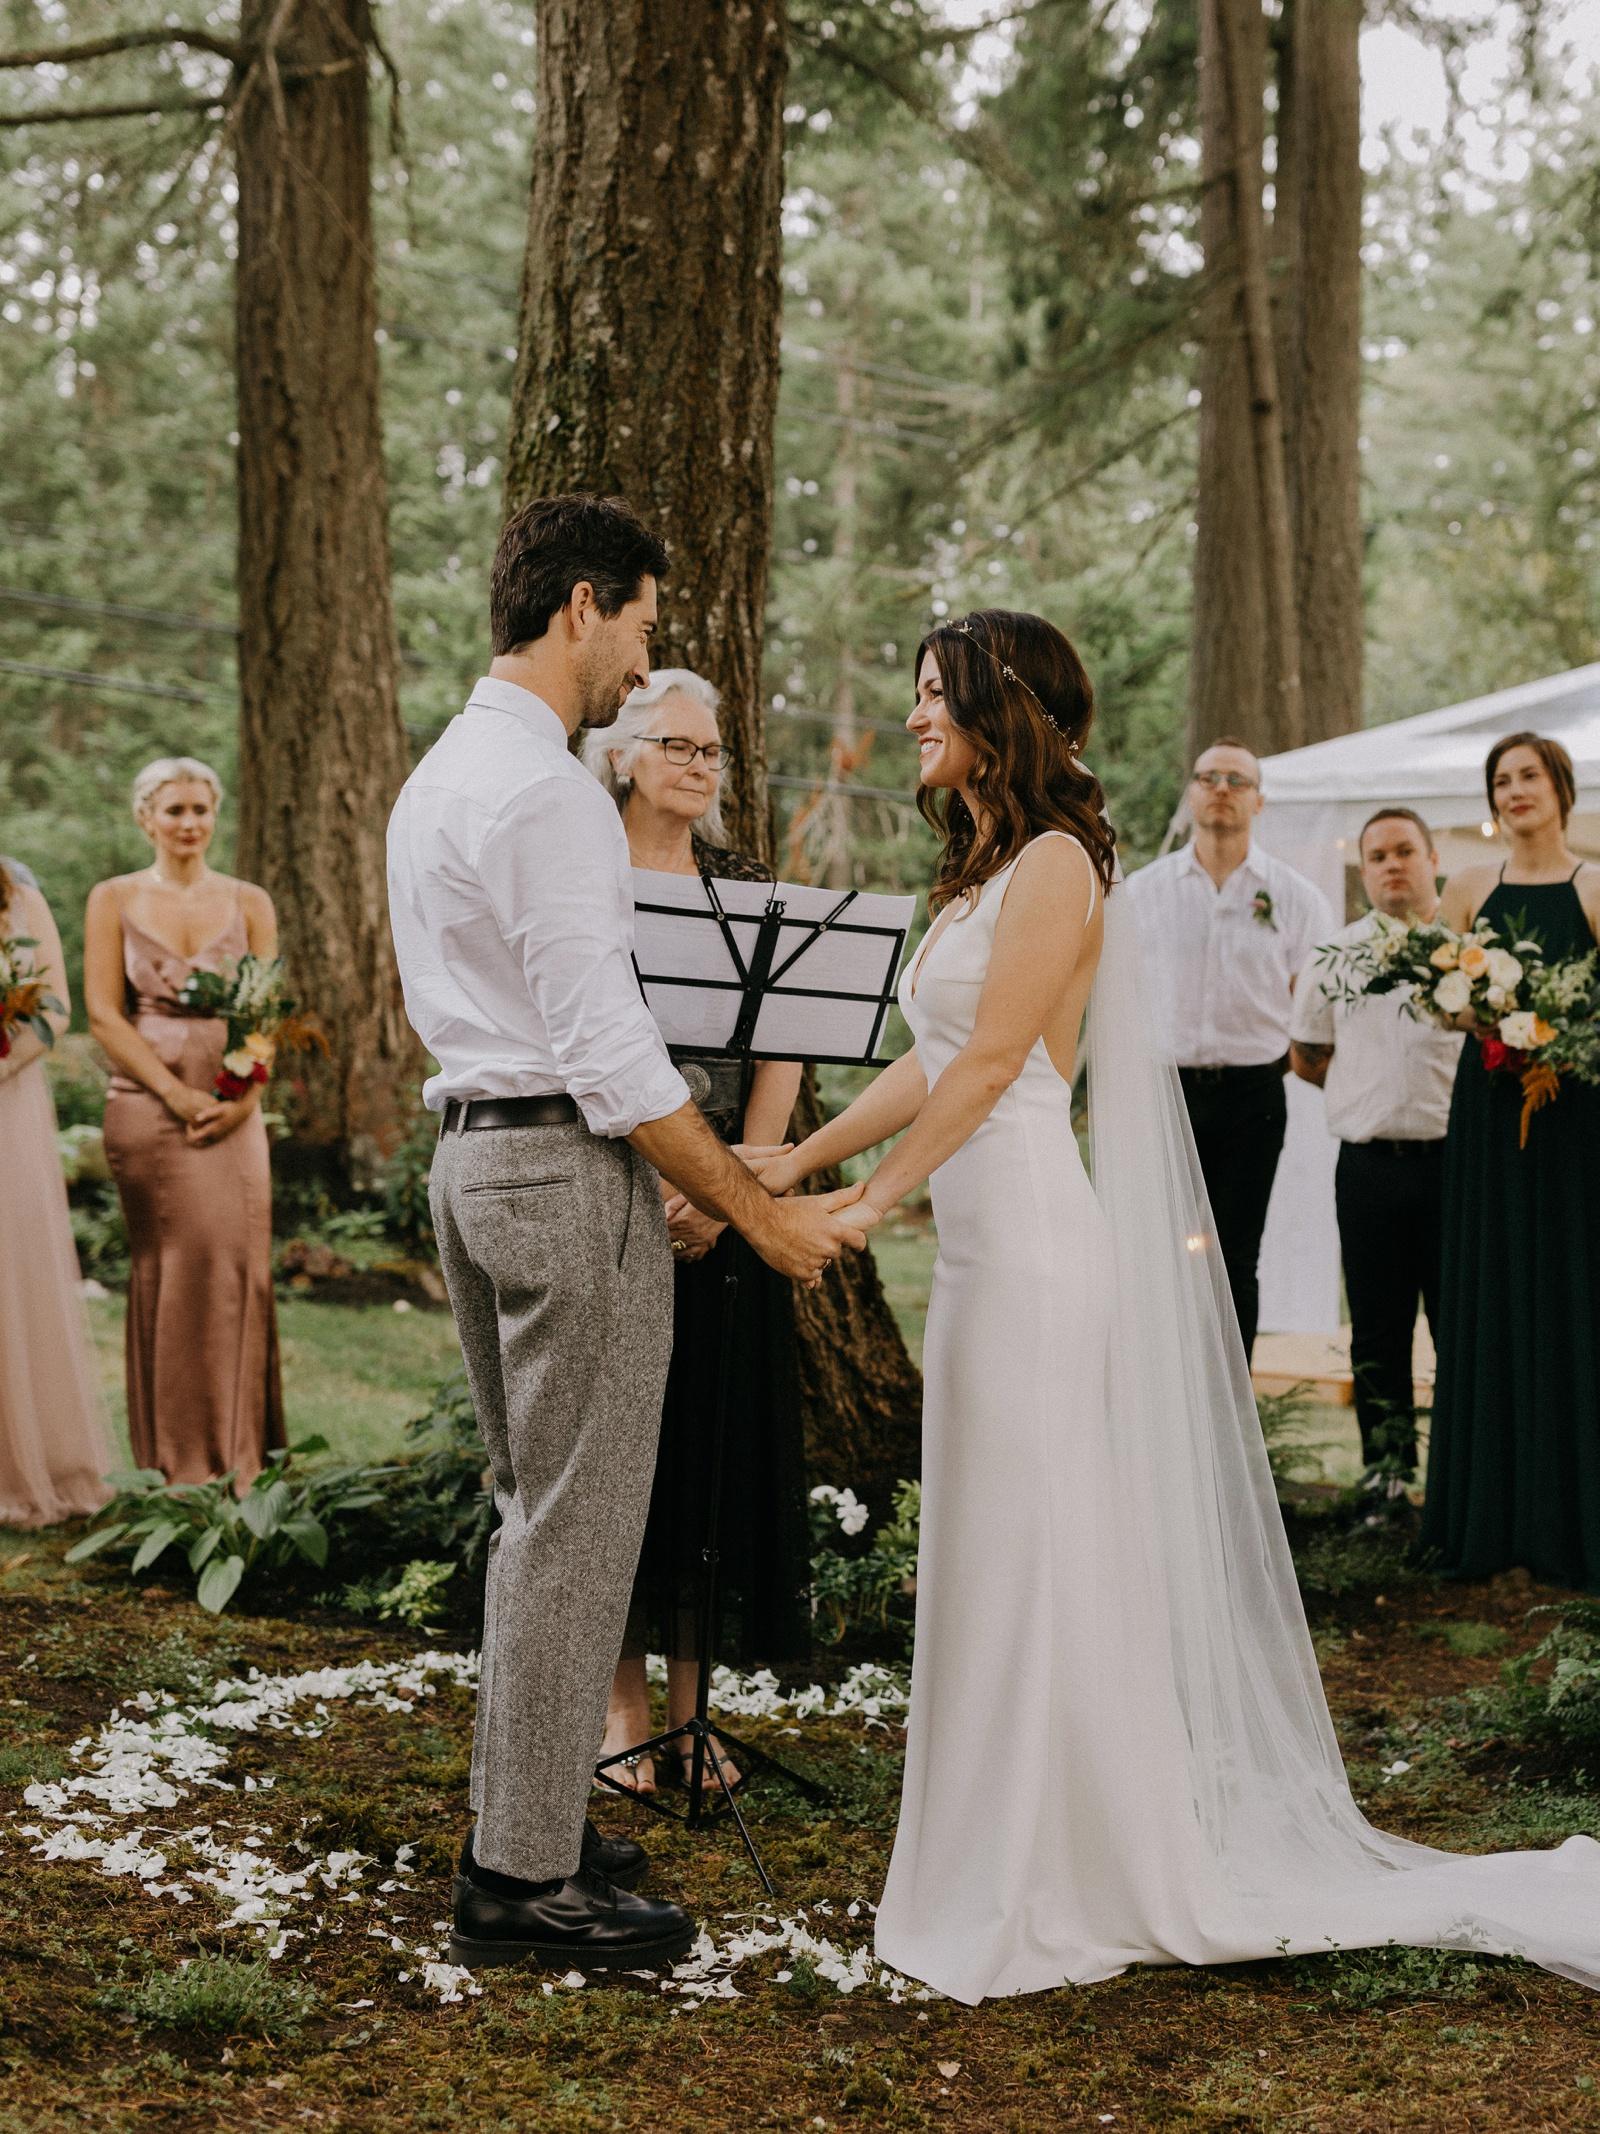 Matthew and Autumn Intimate Outdoor Backyard Wedding_0133